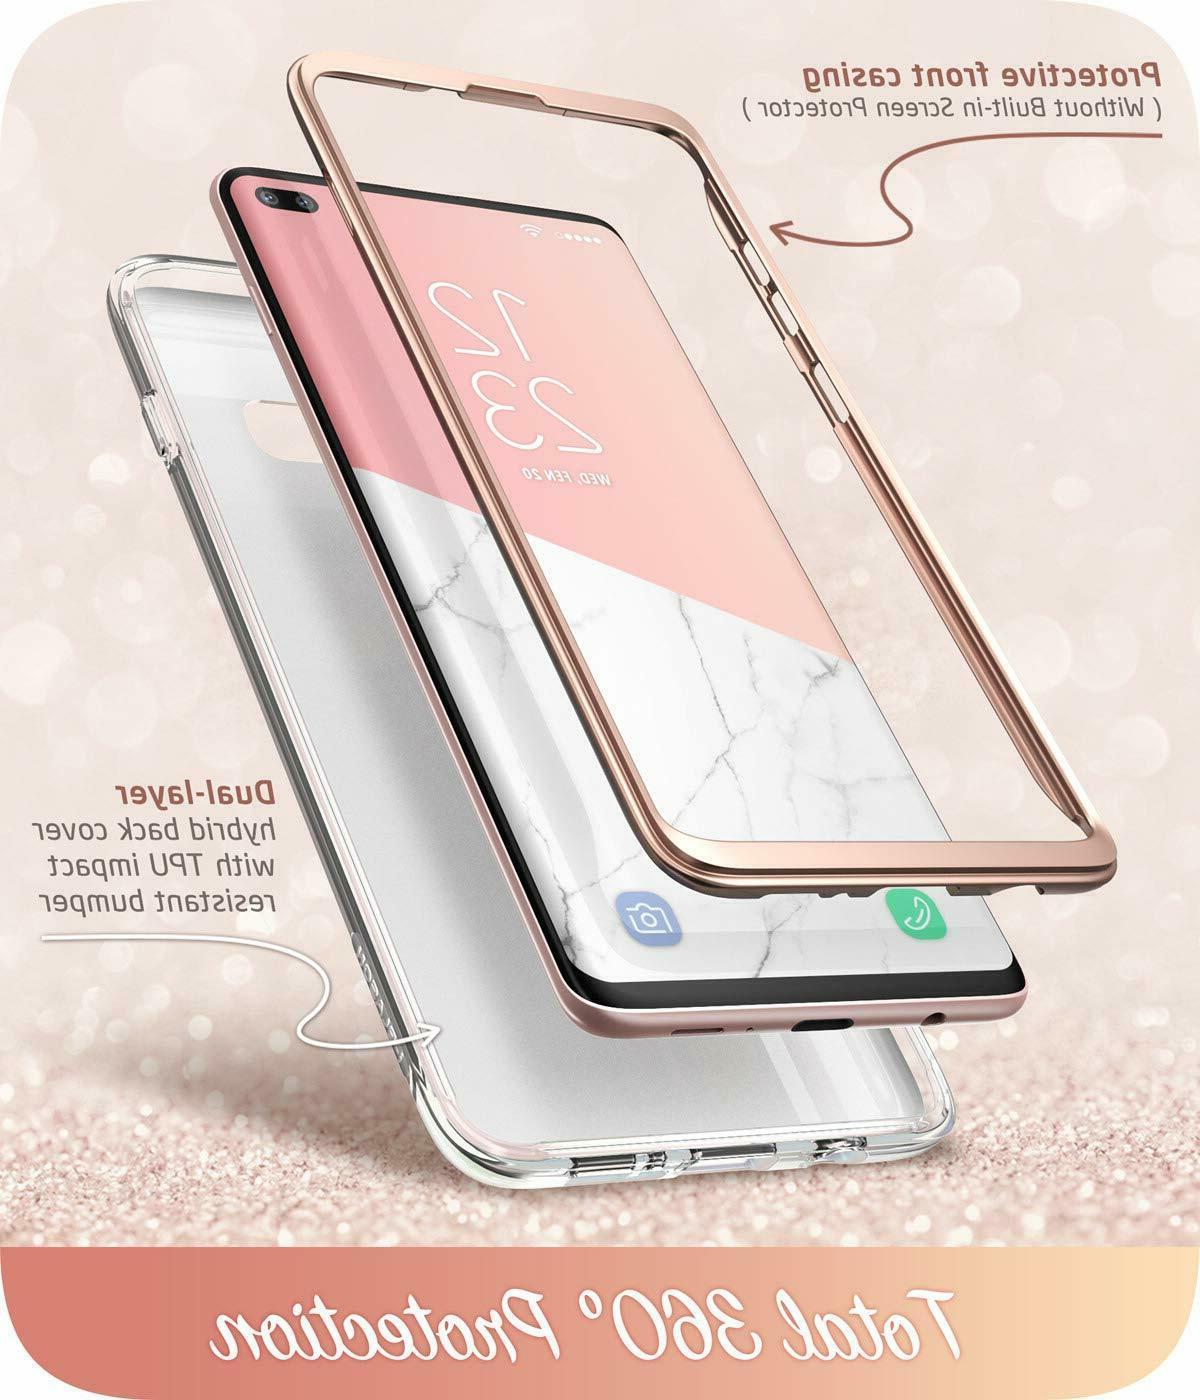 Samsung Galaxy S10 Case, Protective